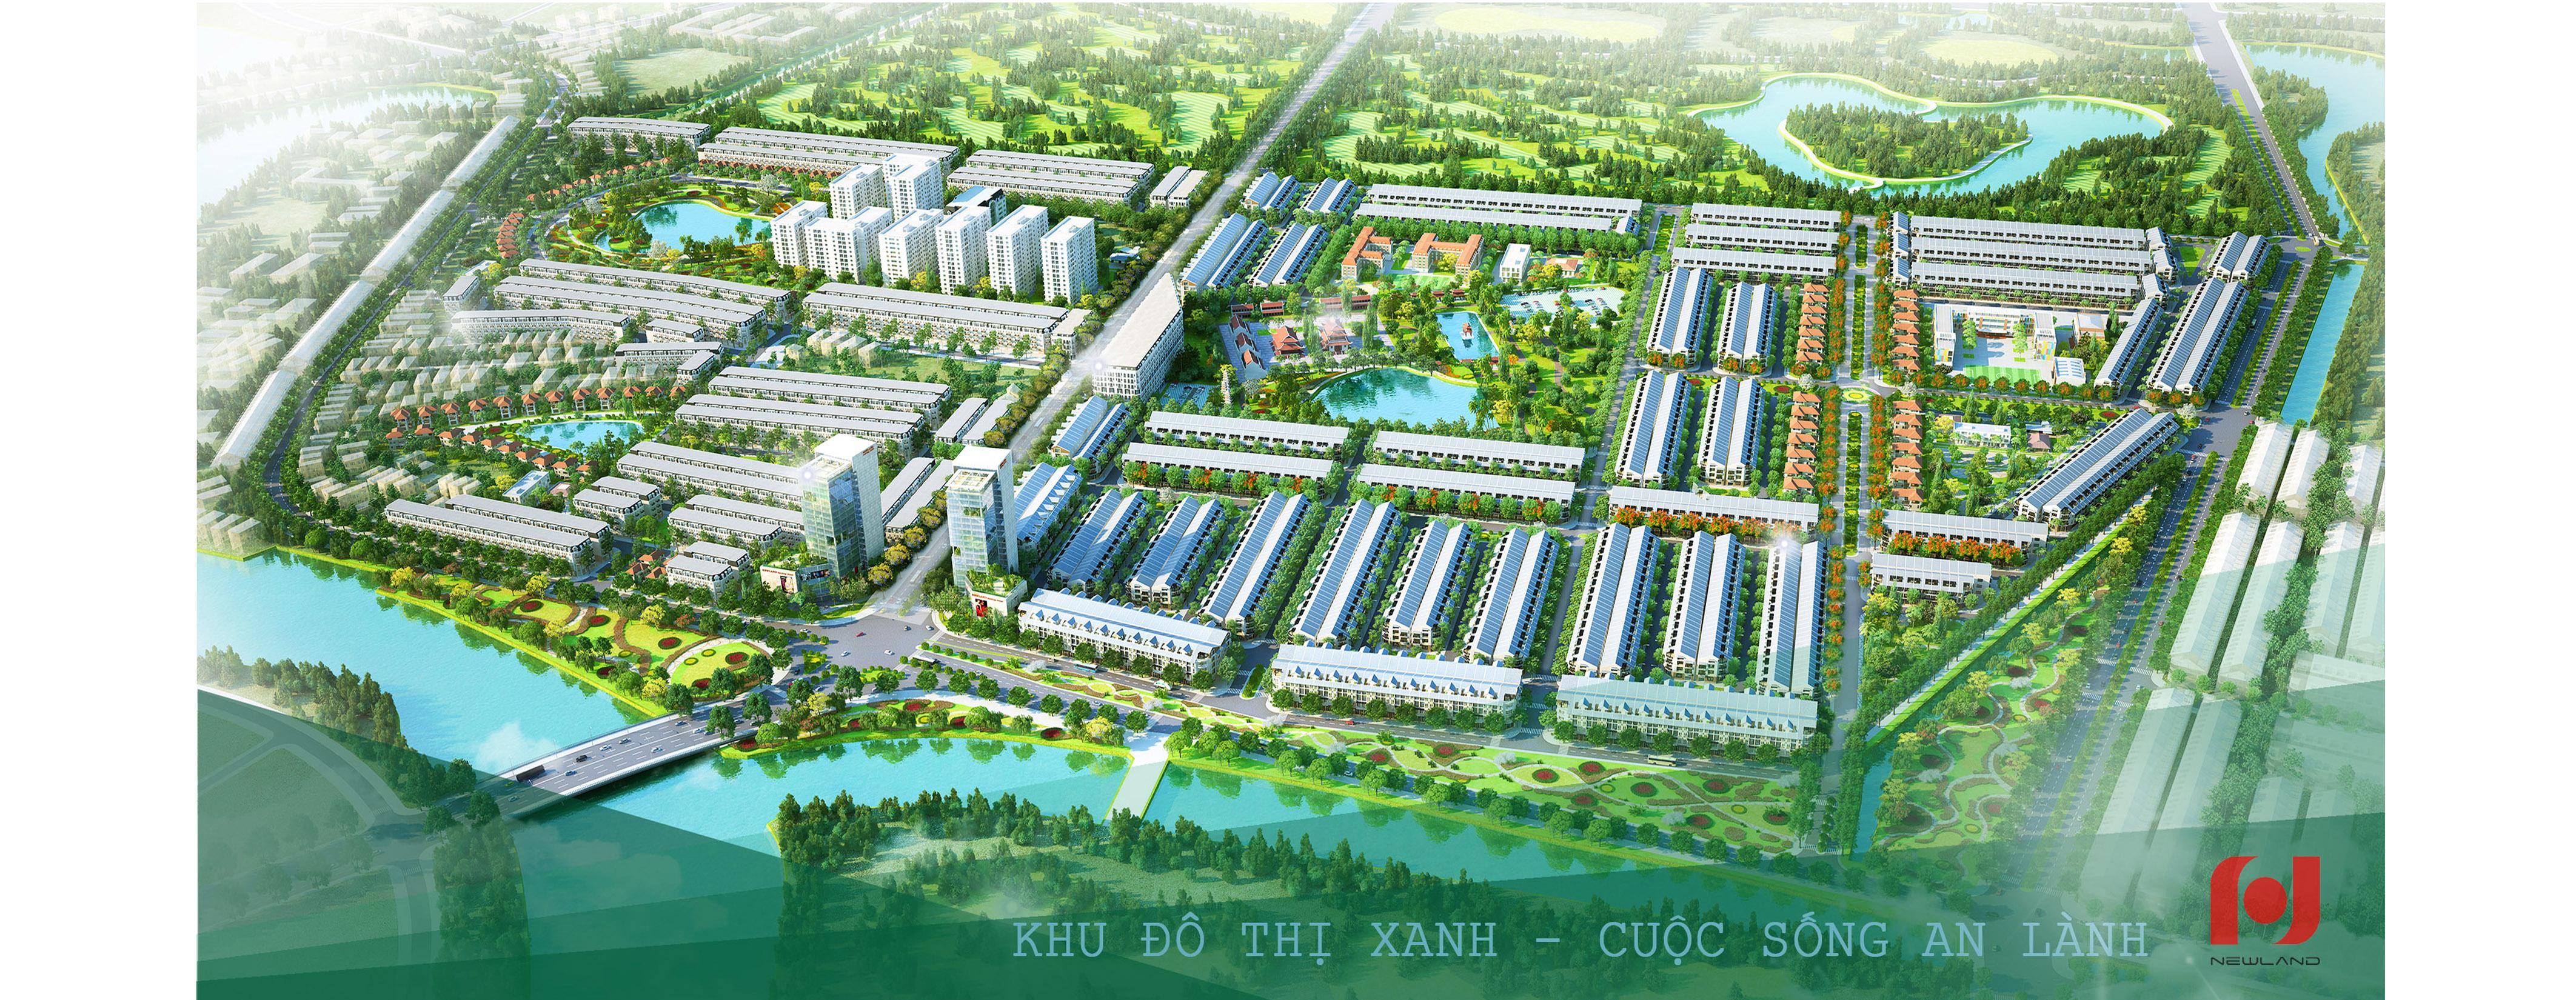 http://newlandgroup.vn/khu-dan-cu-tan-phu-hung